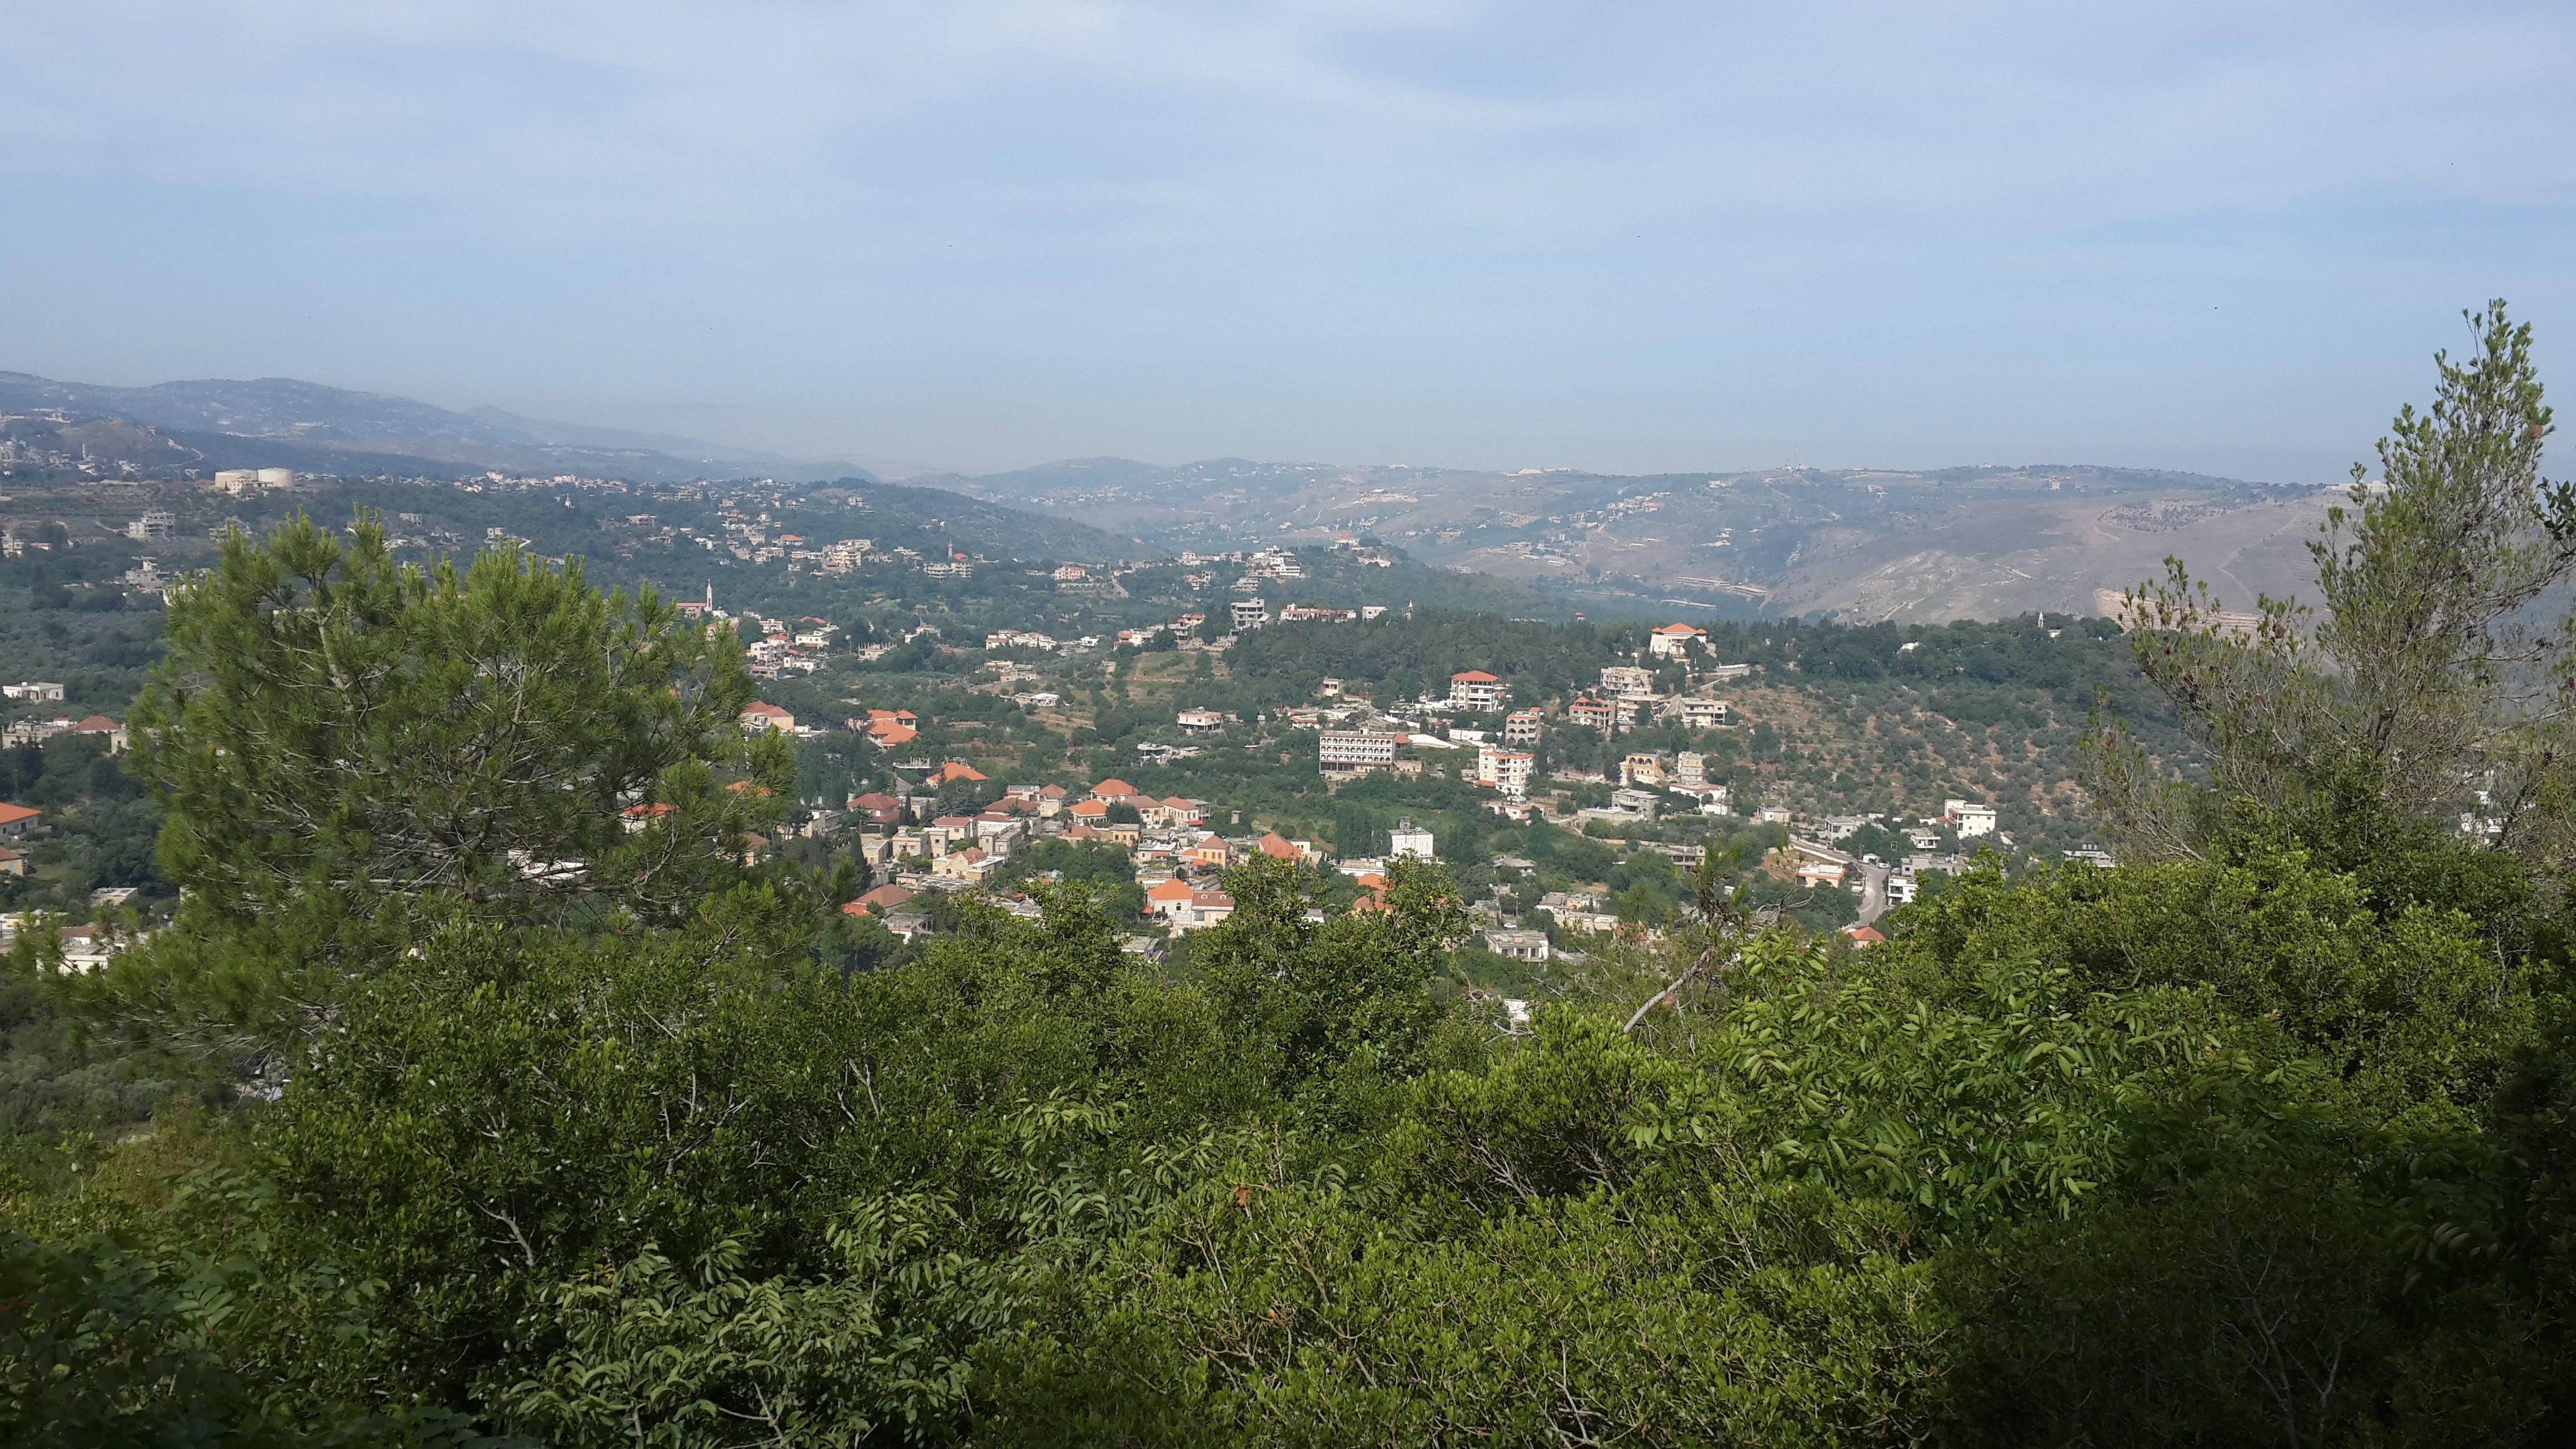 Free stock photo of Lebanon, village